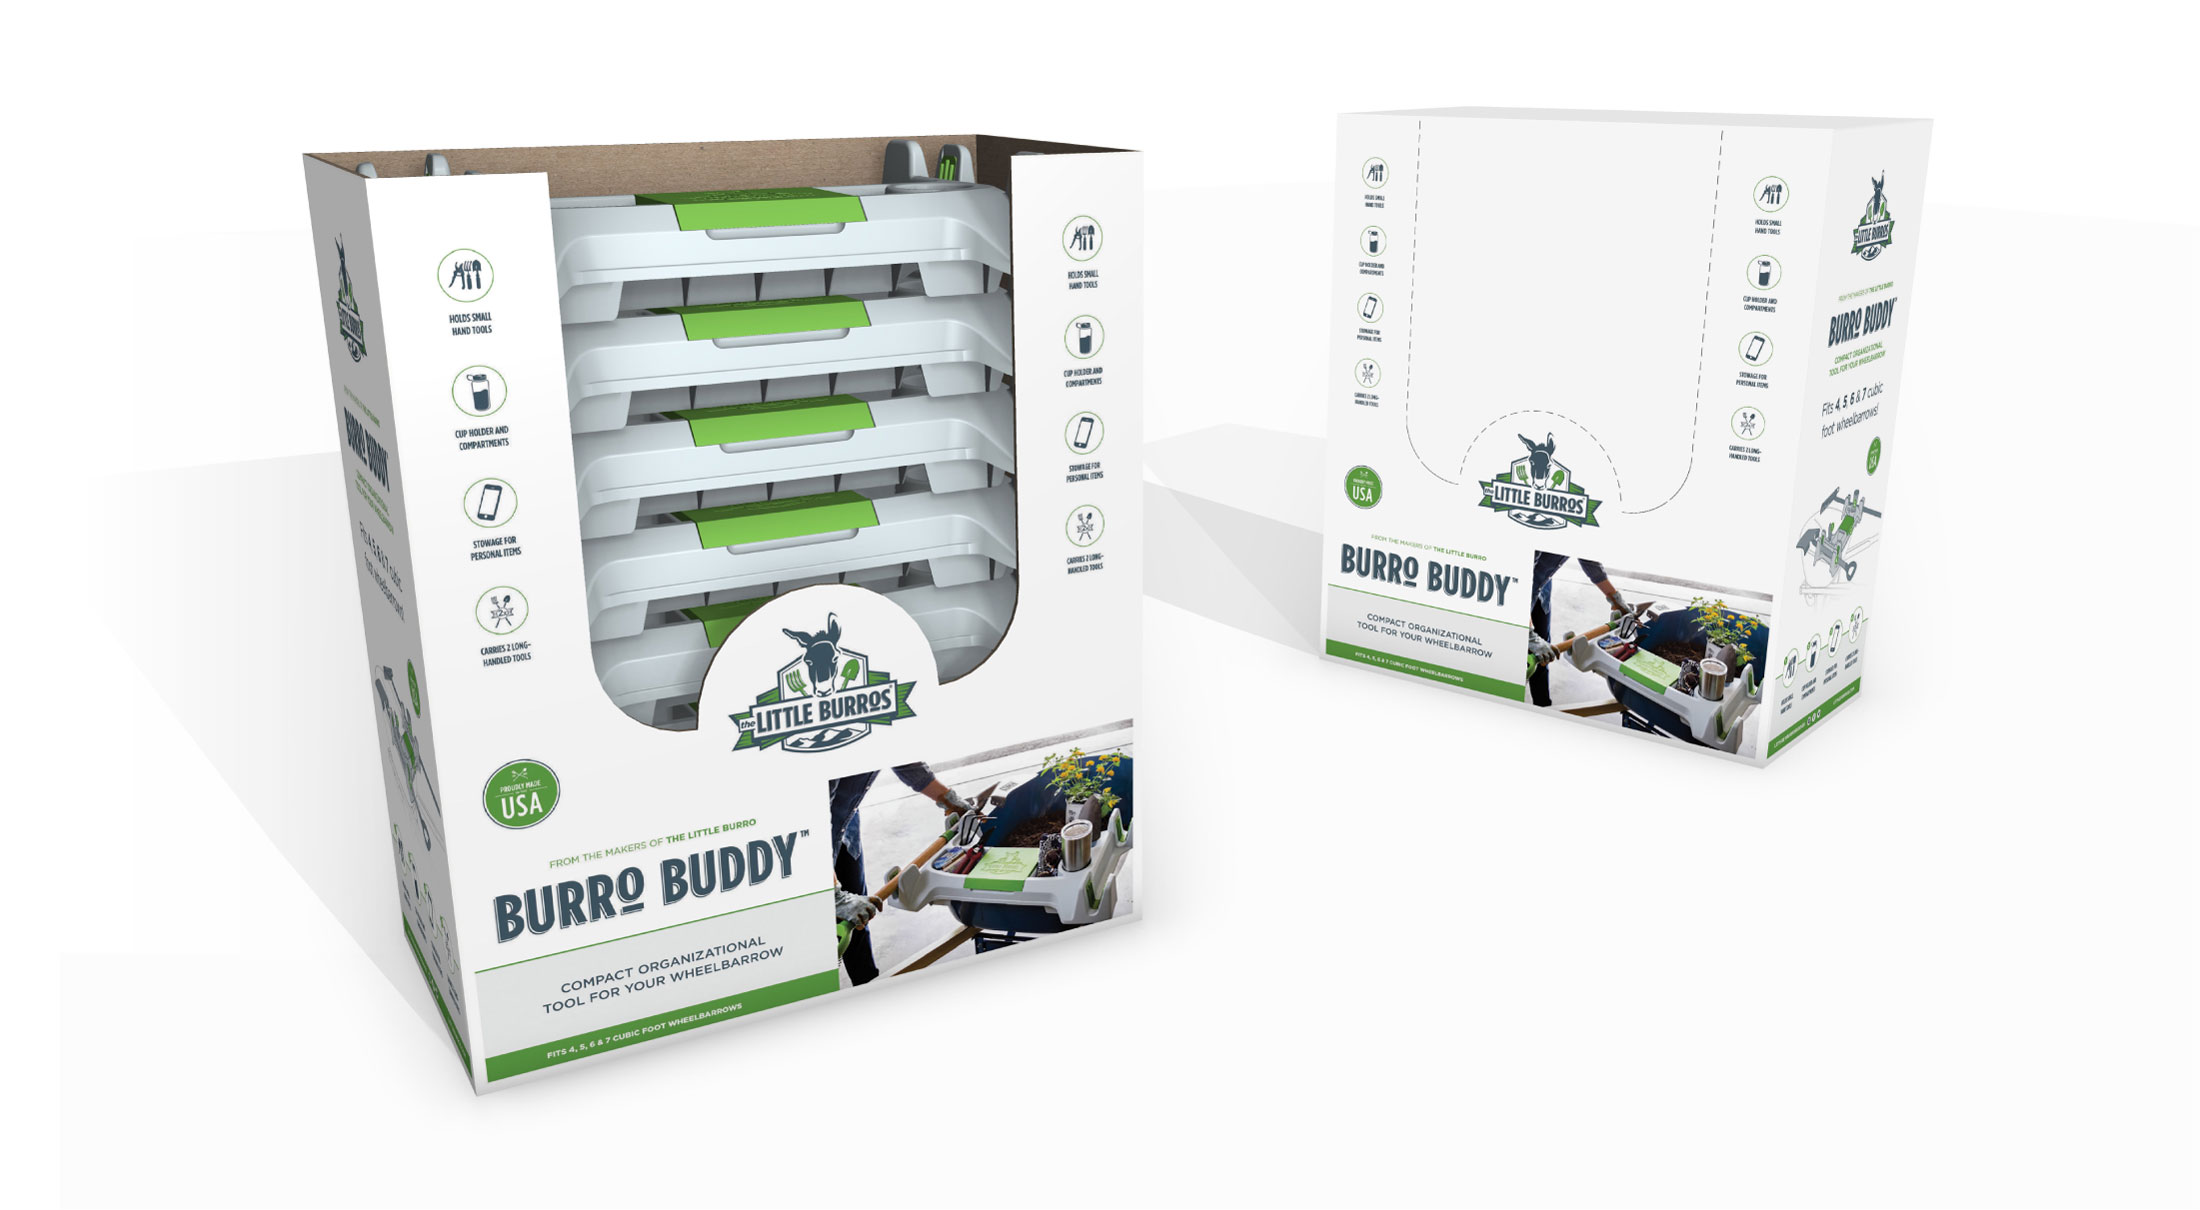 Burro Buddy shipper and store display